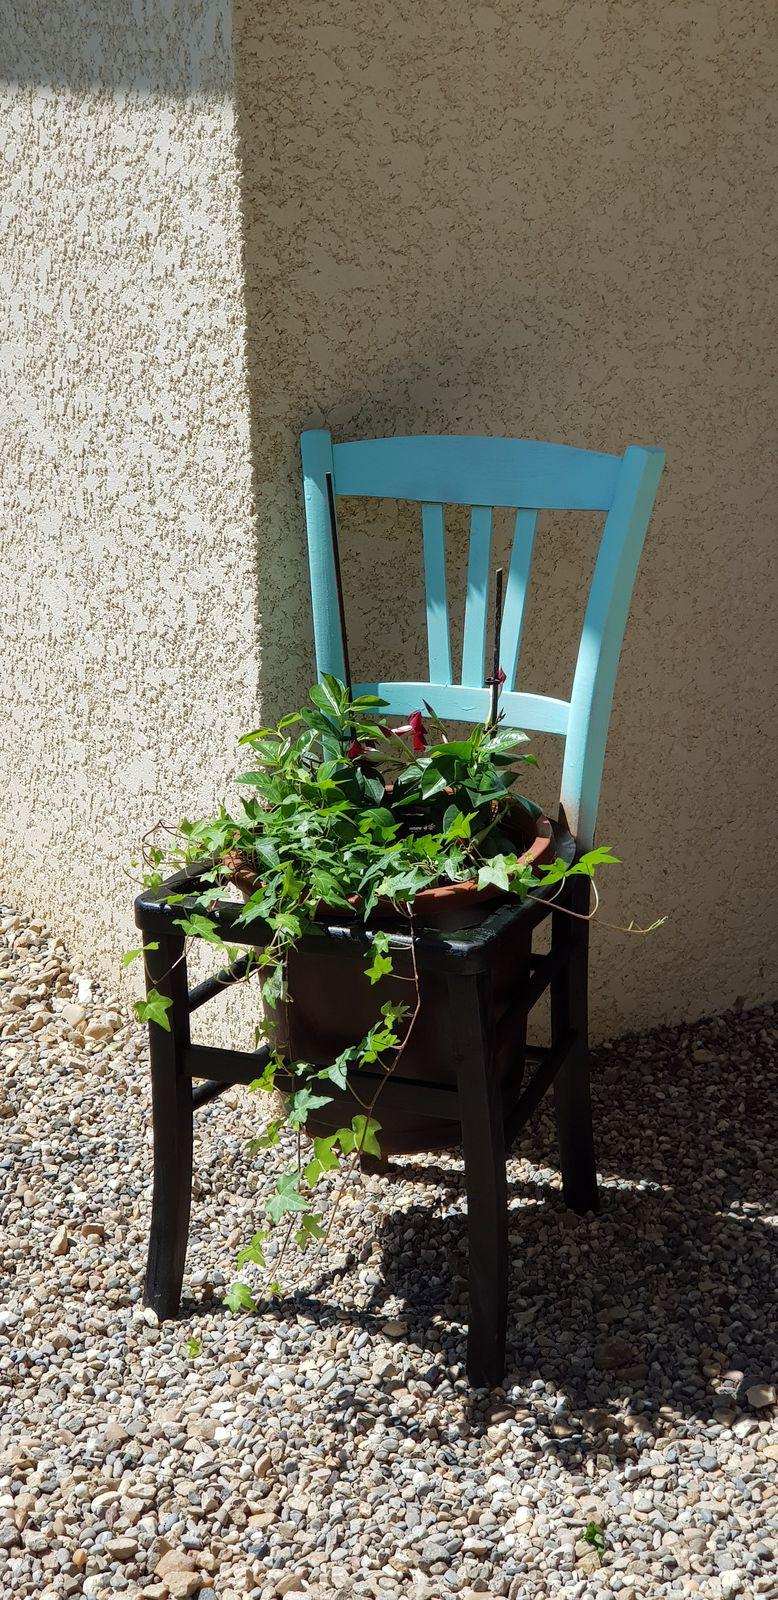 DIY : Do it Yourself : Recyclage d'une chaise en bois